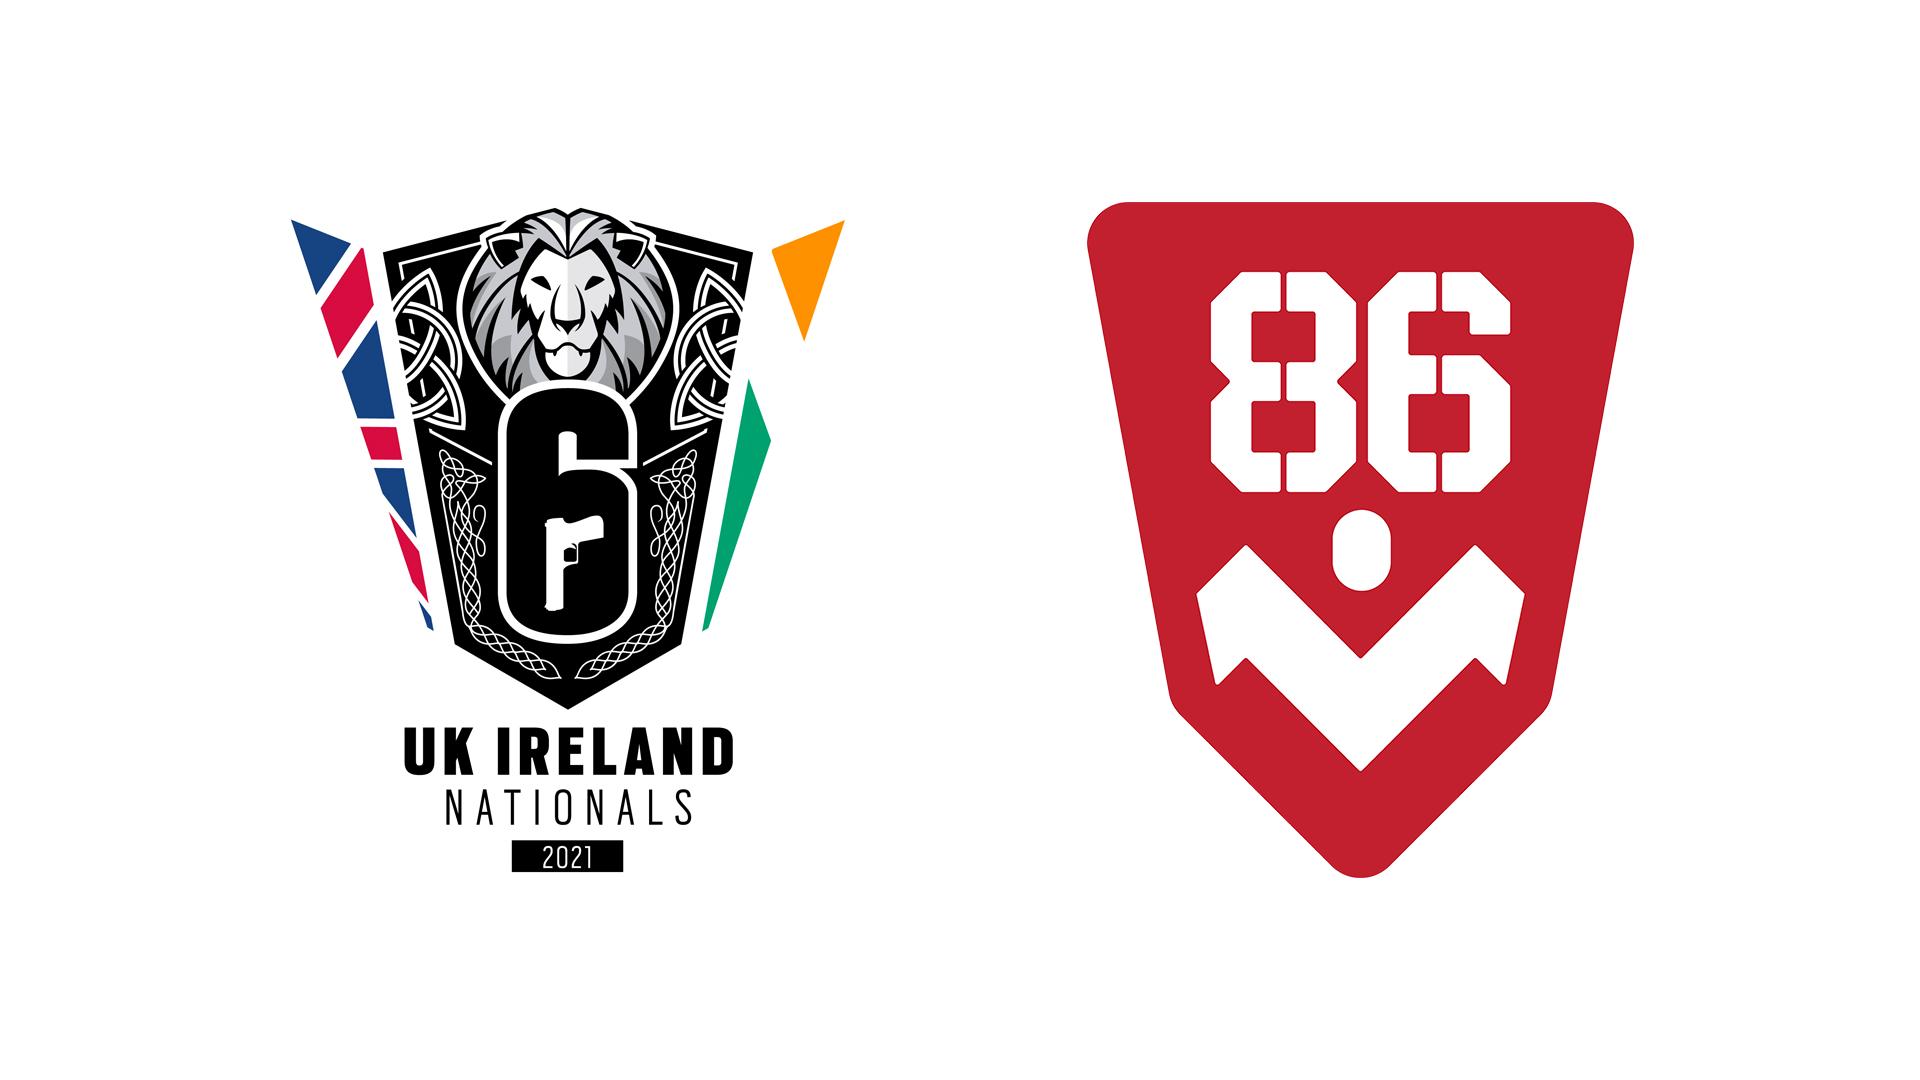 Viperio acquire Team 86 to compete in UKI Nationals Premier Division